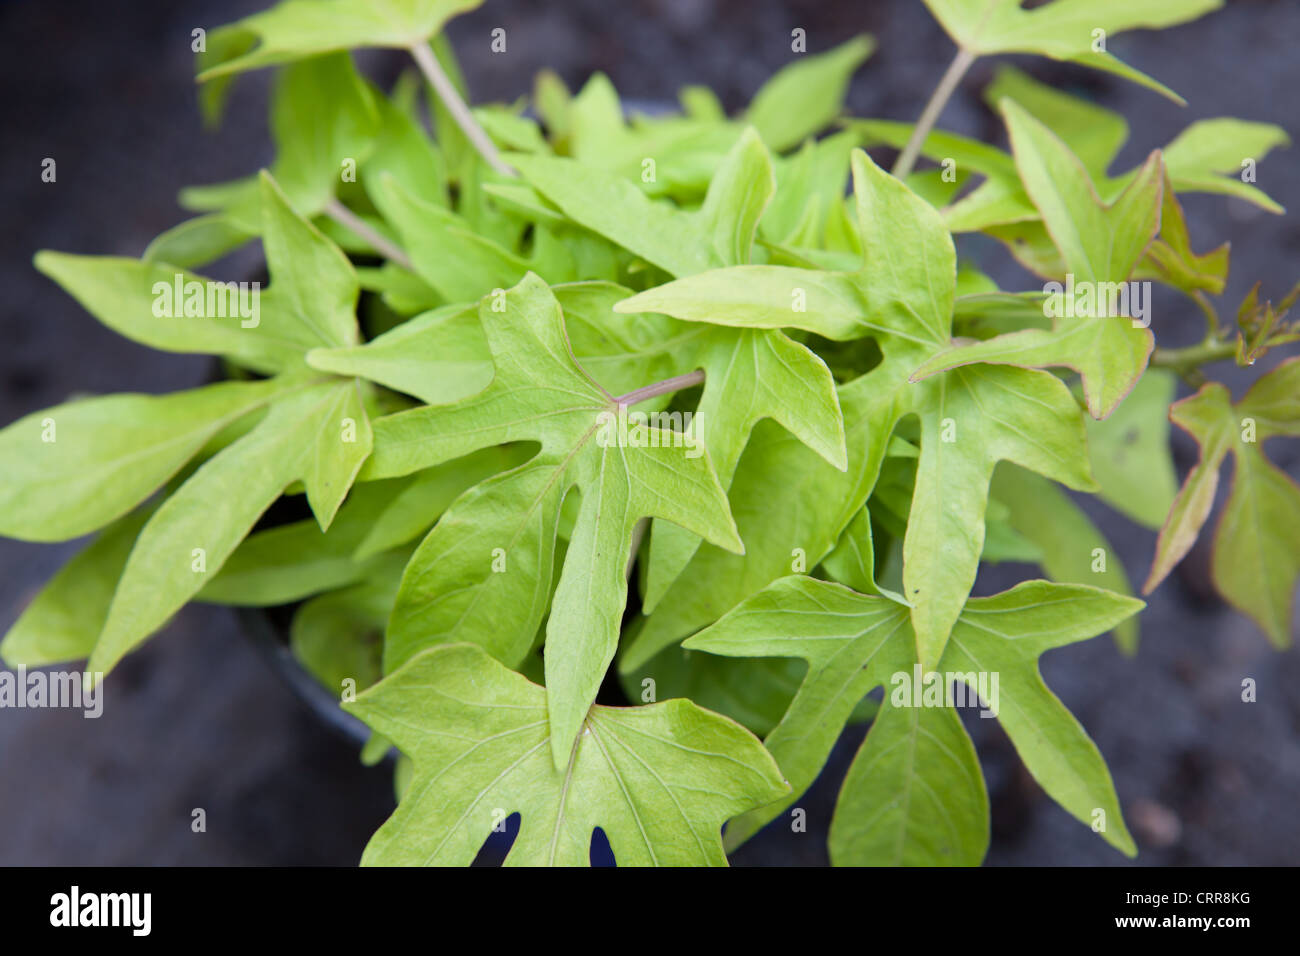 The Ornamental Sweet Potato Vine Ipomoea Batatas Stock Photo Alamy